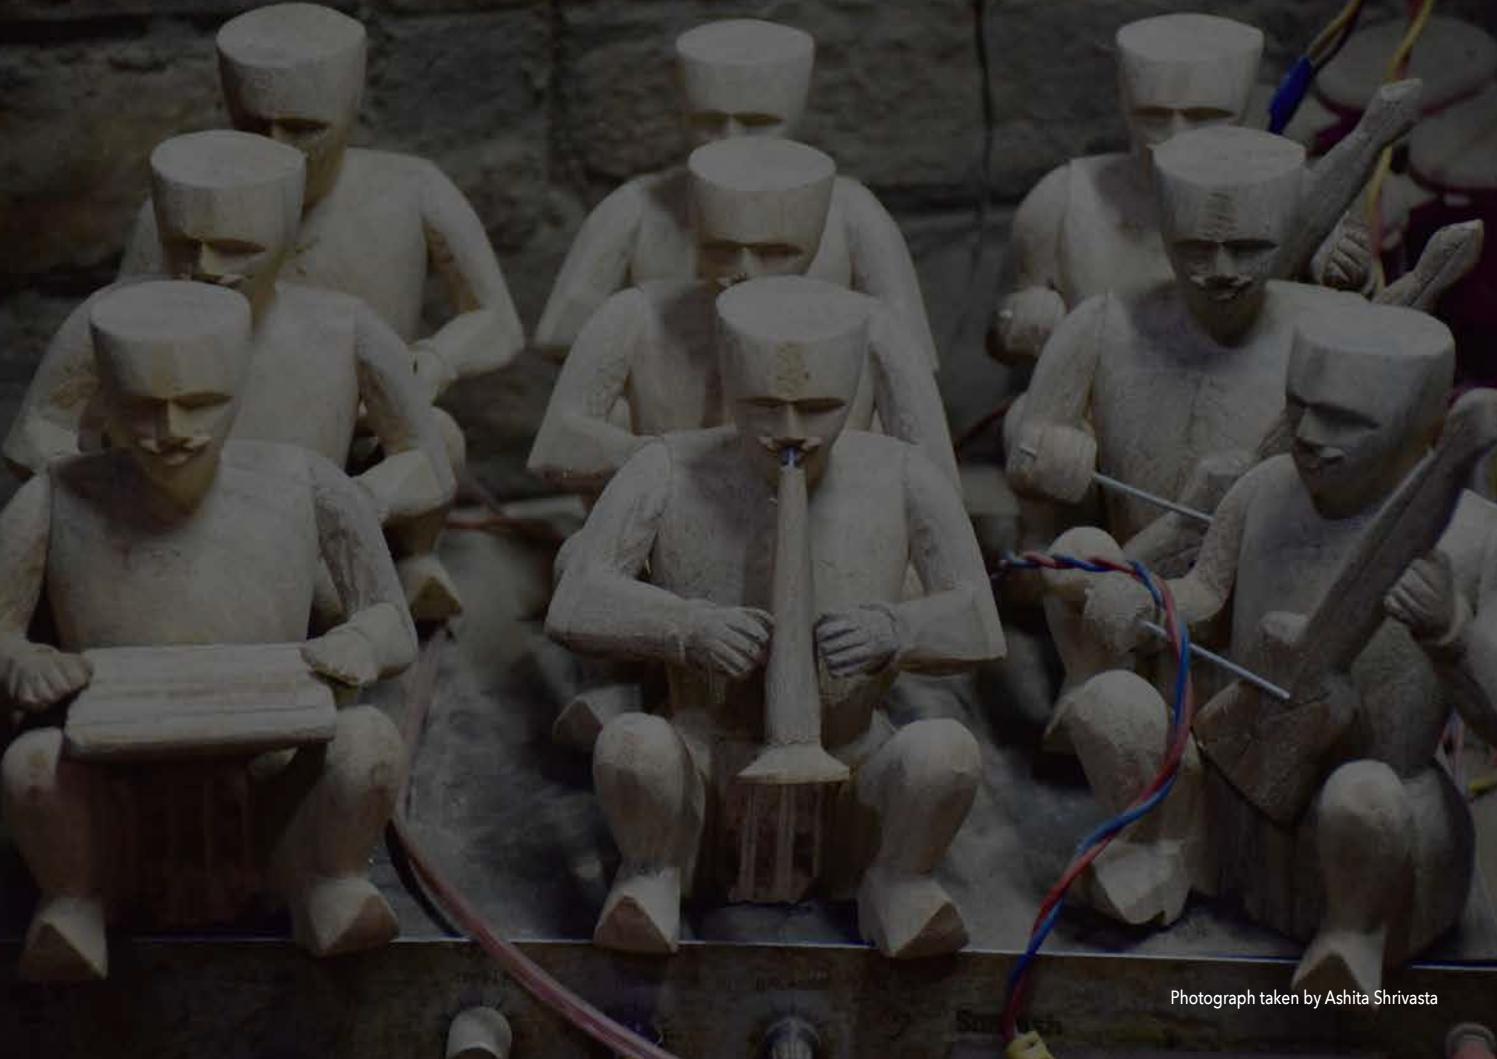 kashi kaath kari - unfolding story of varanasi wooden toy